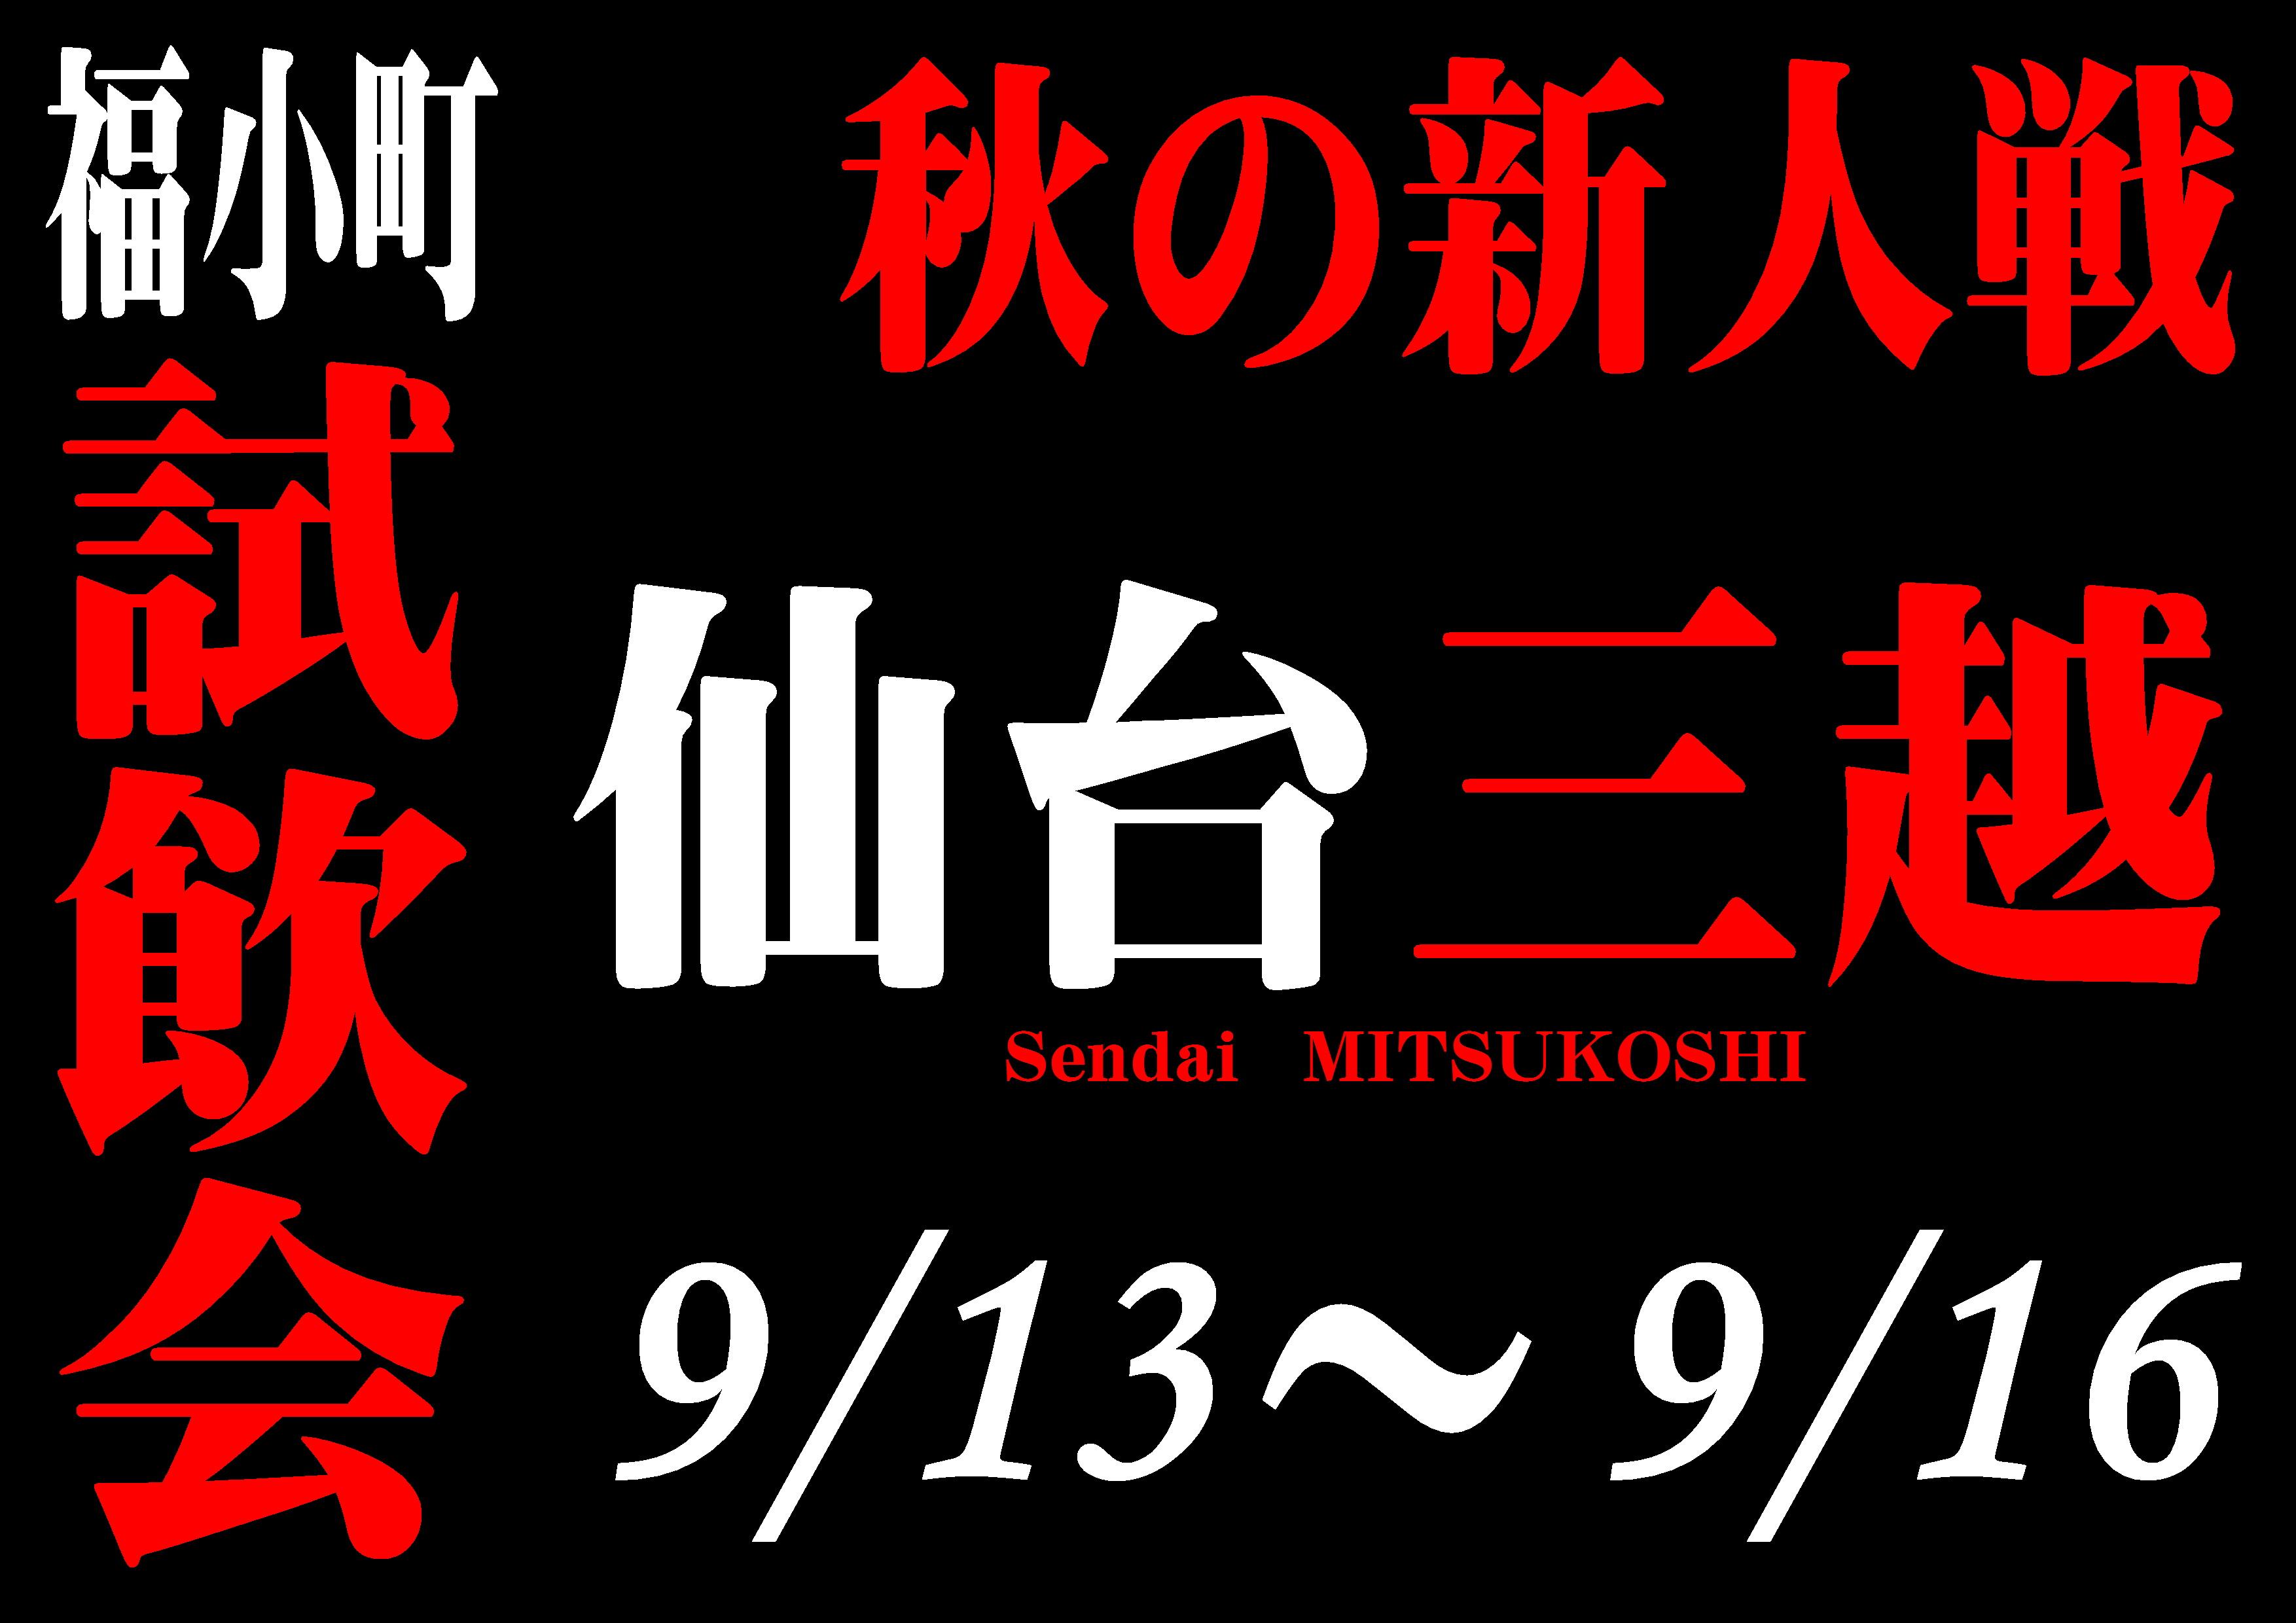 http://www.fukukomachi.com/blog/photo/20190912-1.JPG